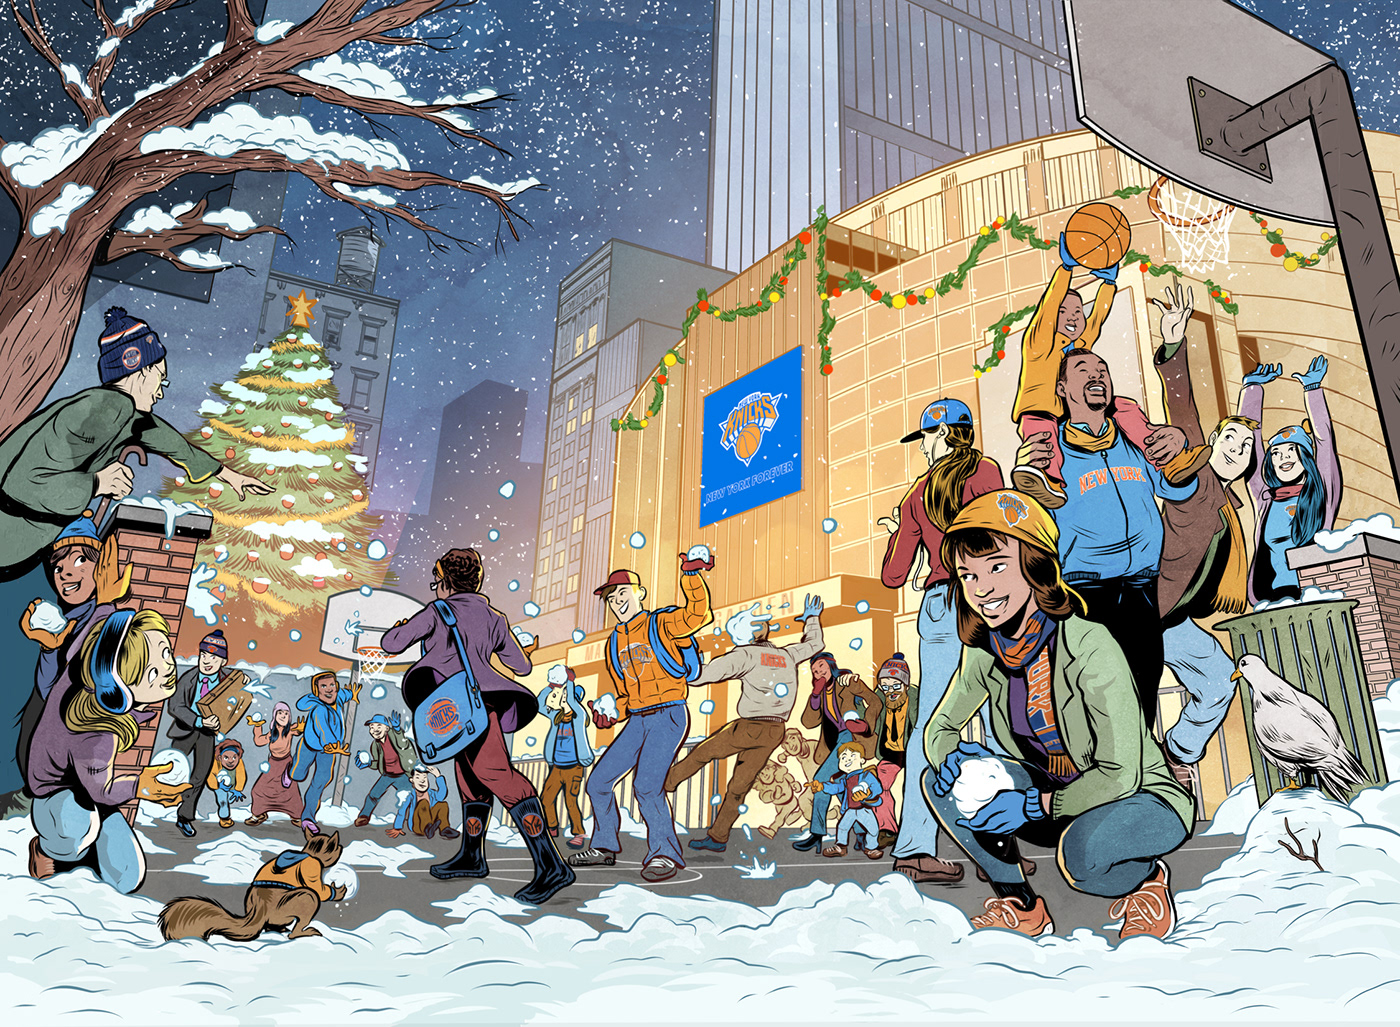 Image may contain: cartoon, snow and skiing